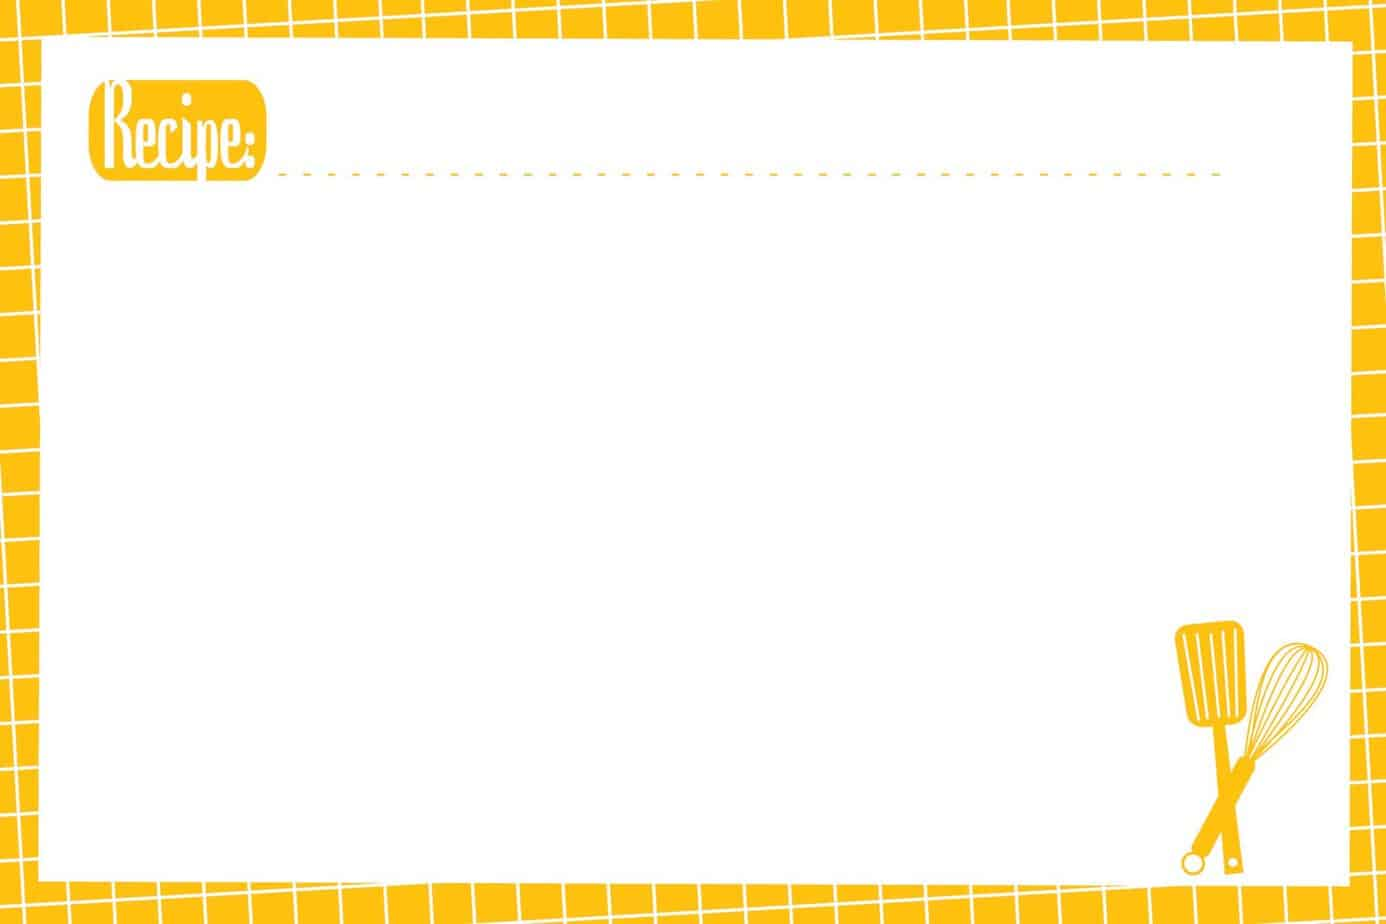 Recipe Card Template 32364  Microsoft Office Recipe Card Template